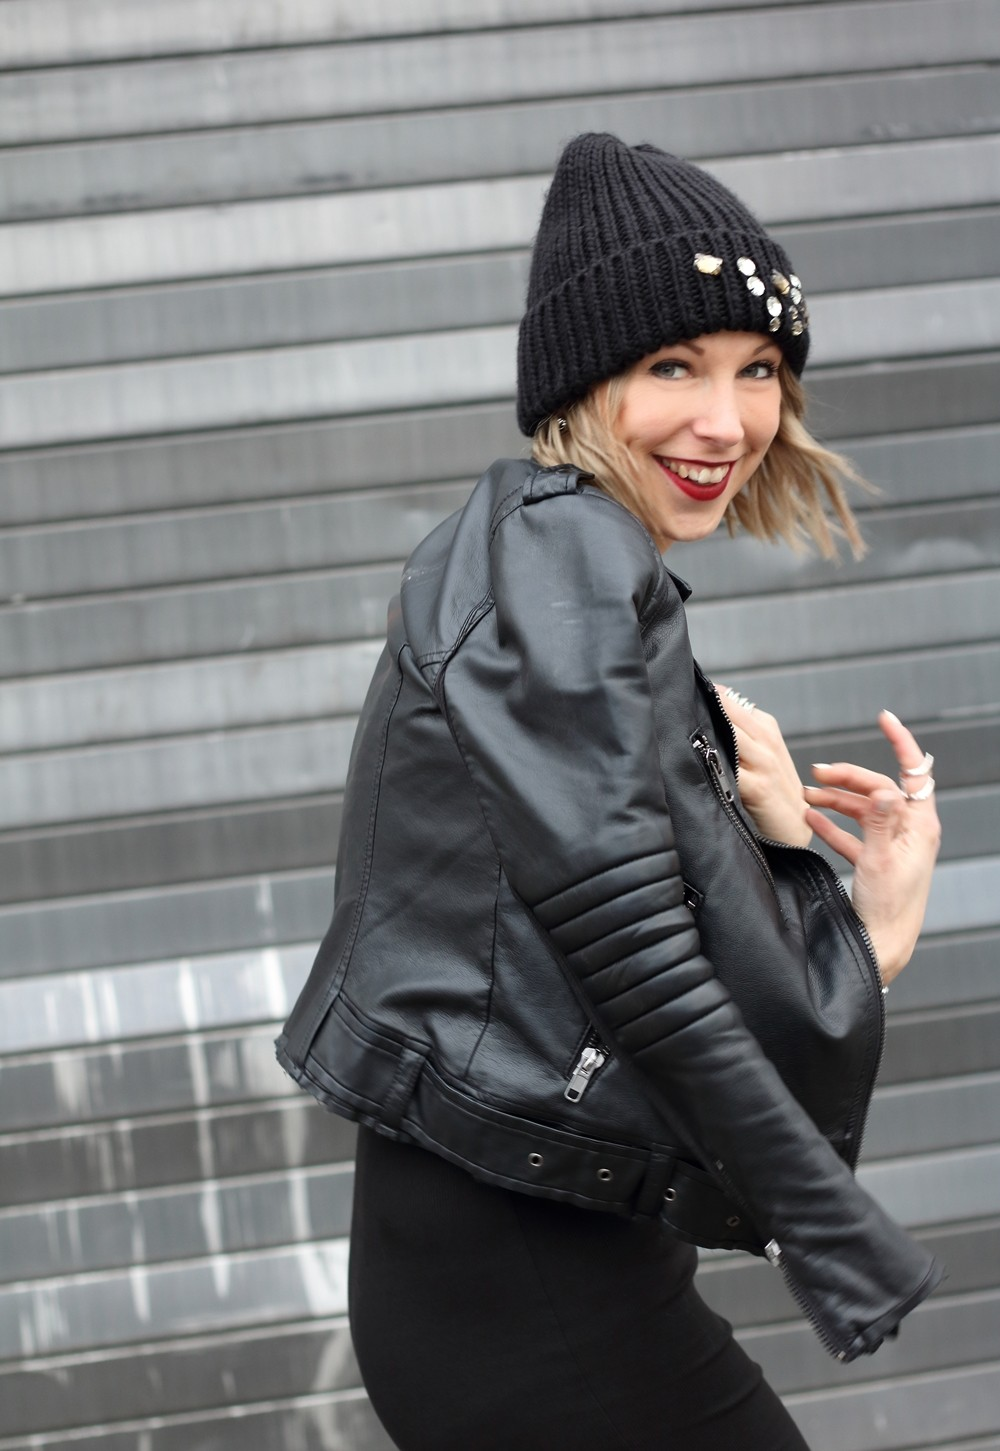 Outfit All in black Midikleid Lederjacke Chucks Beanie 15